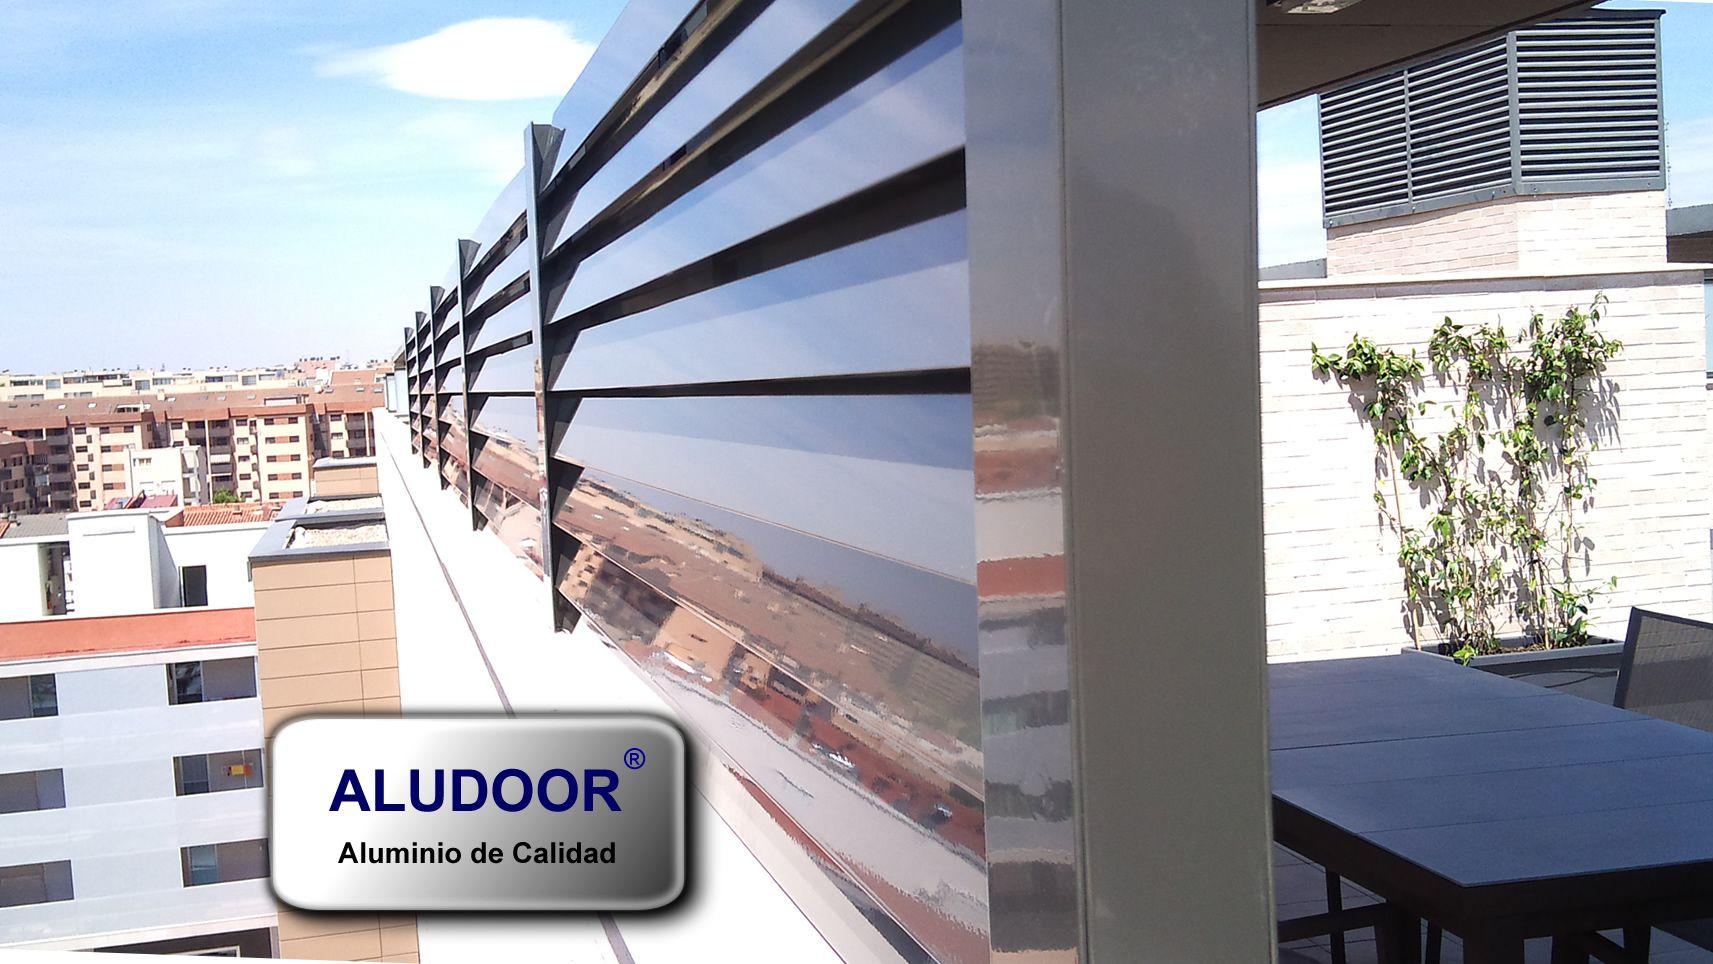 Valla ventilada de aluminio de calidad dise o vallas exteriores en aluminio aluminium fence - Vallas de diseno ...